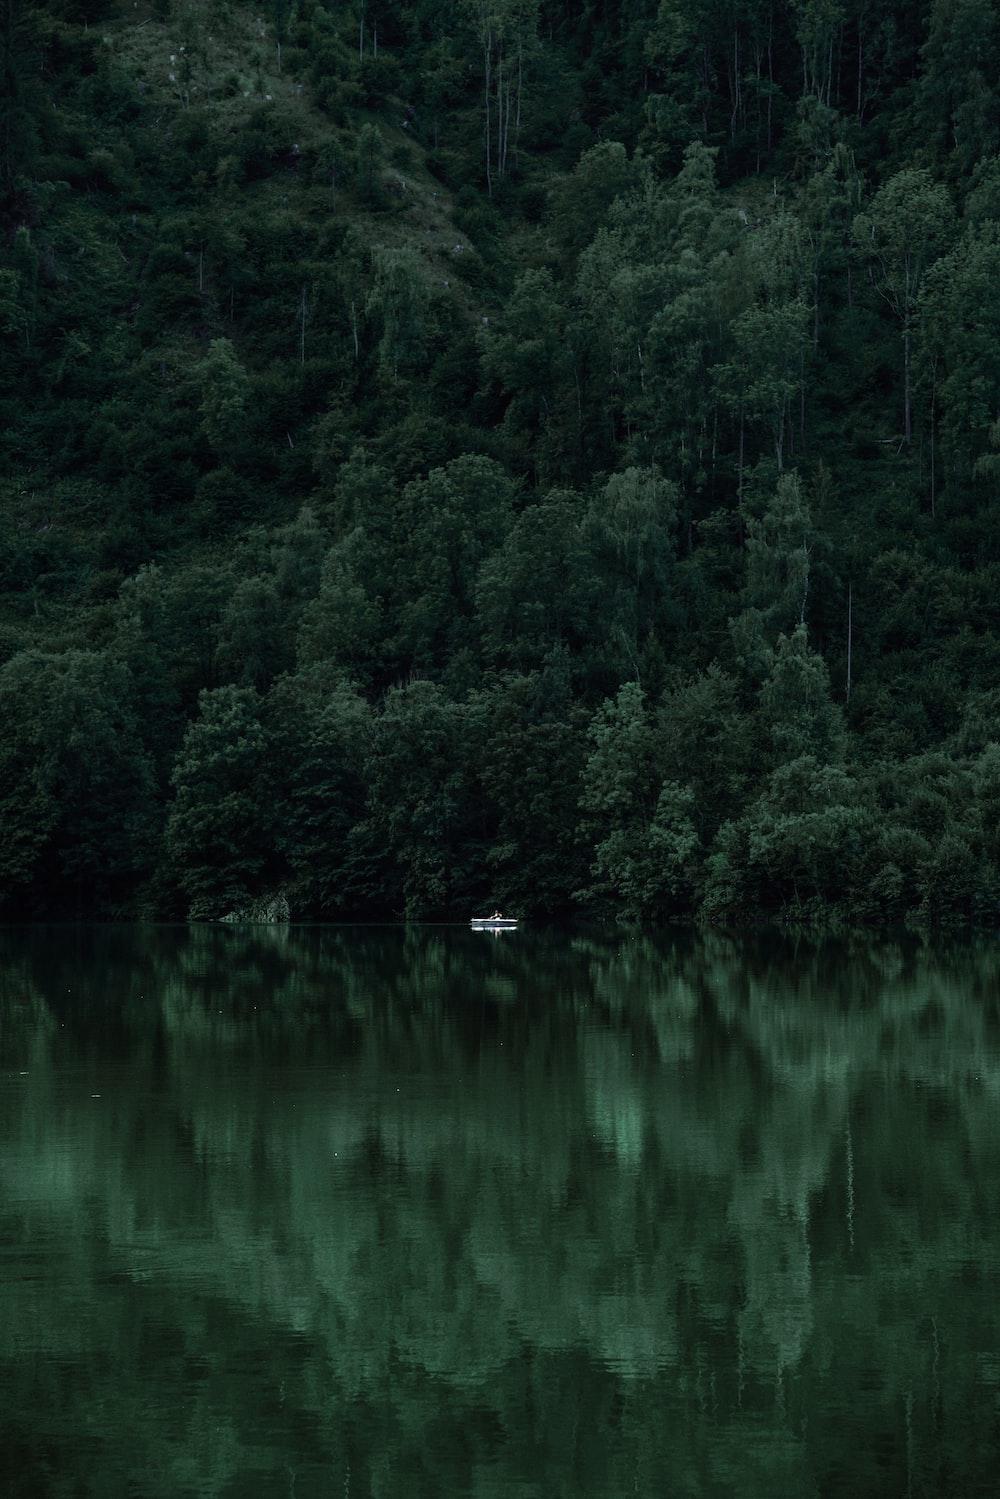 Crystal-clear lake in Banff | HD photo by Tj Holowaychuk